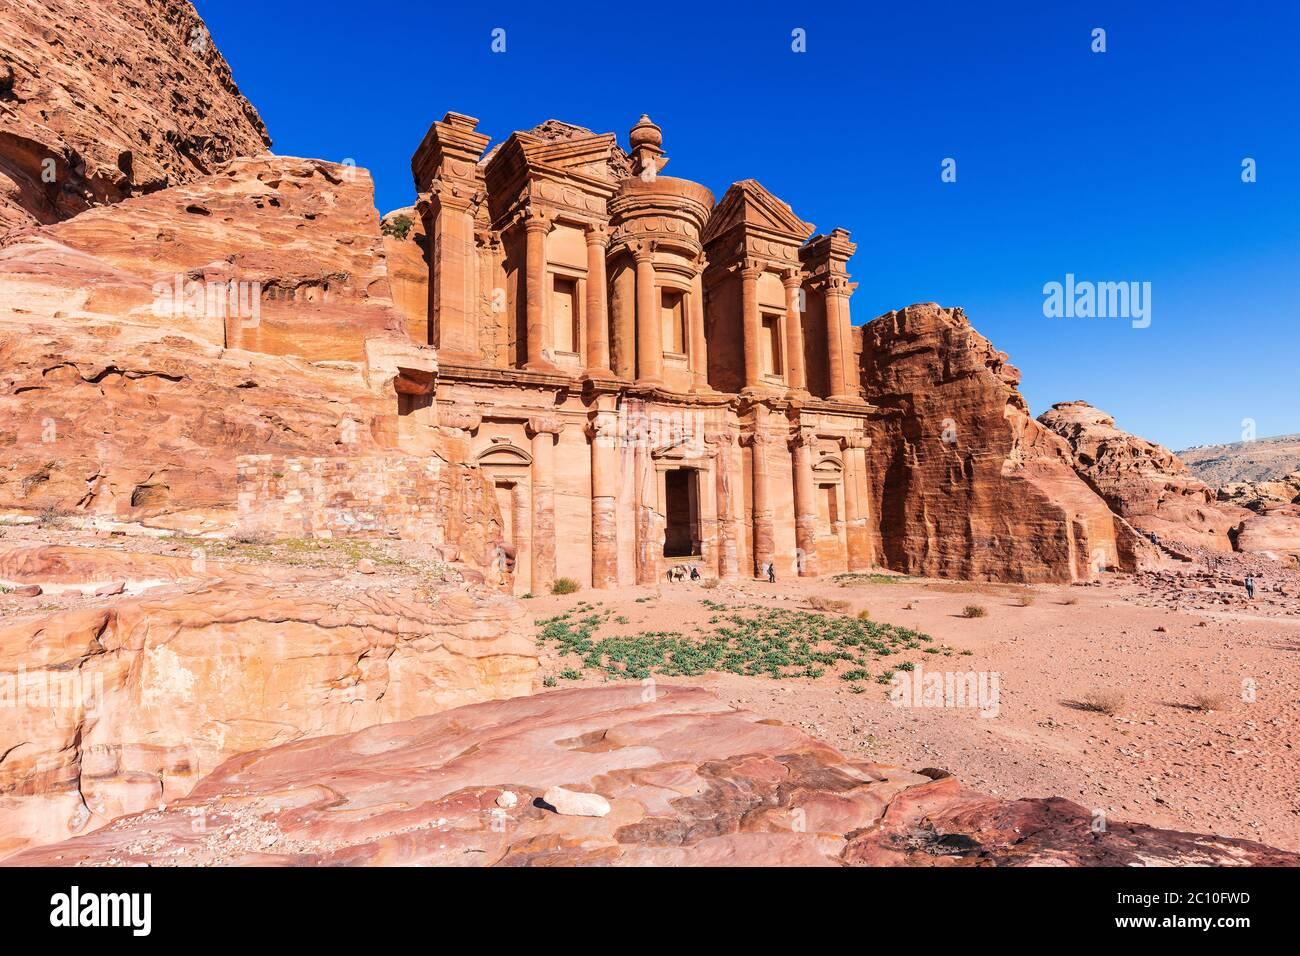 Petra, Jordan. Al-Khazneh (The Treasury) in Petra, the capital of the ancient Nabatean Kingdom. Stock Photo